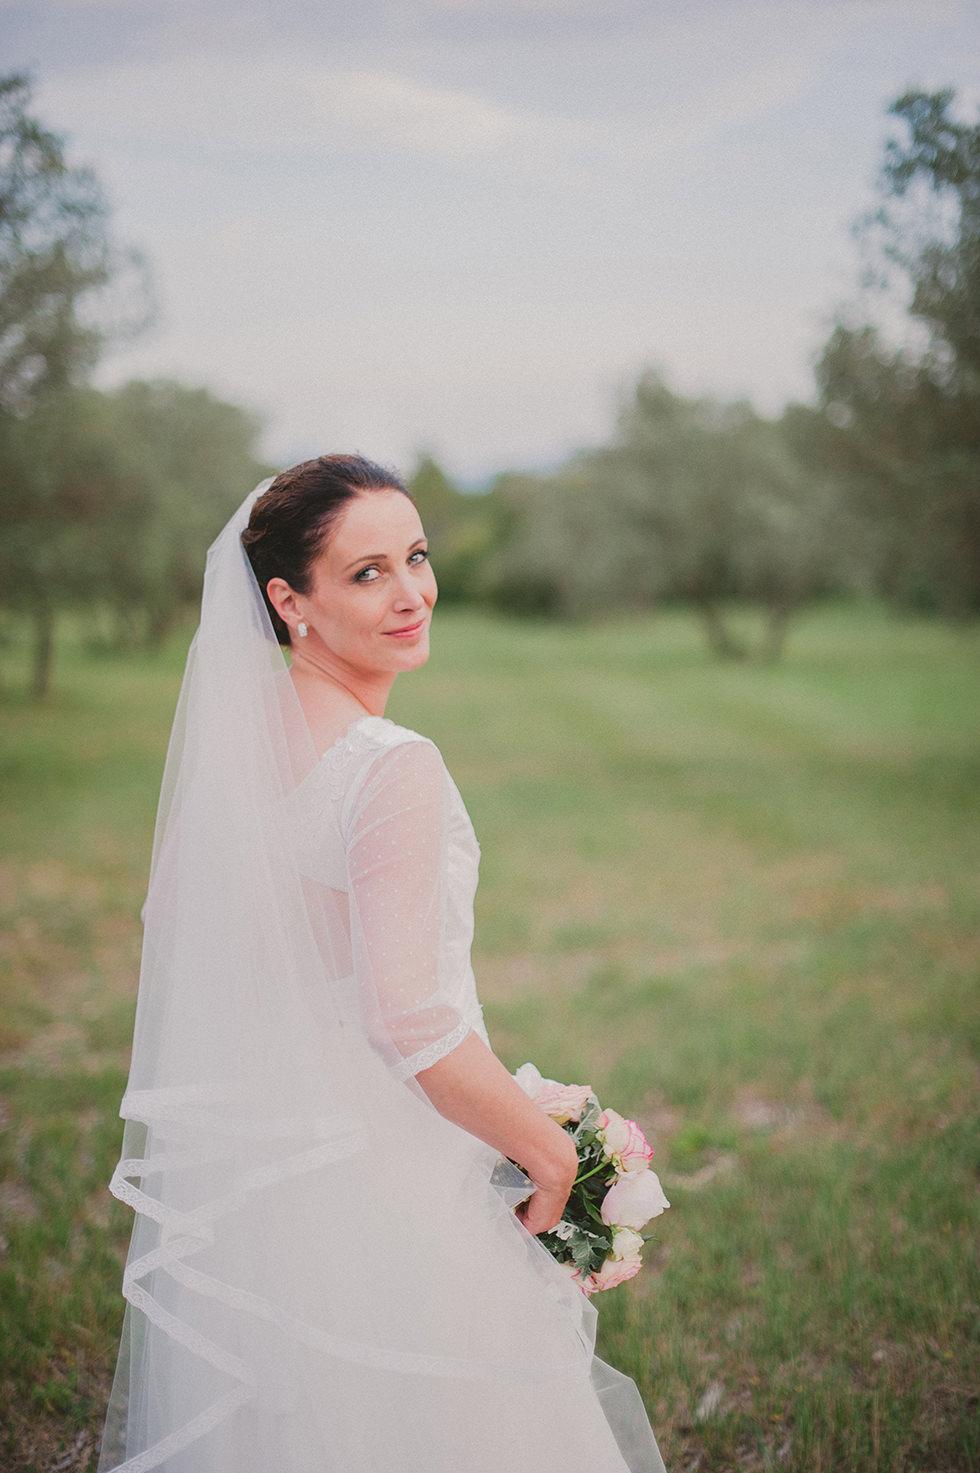 ©Les Histoires d'A. - photographe mariage Nice